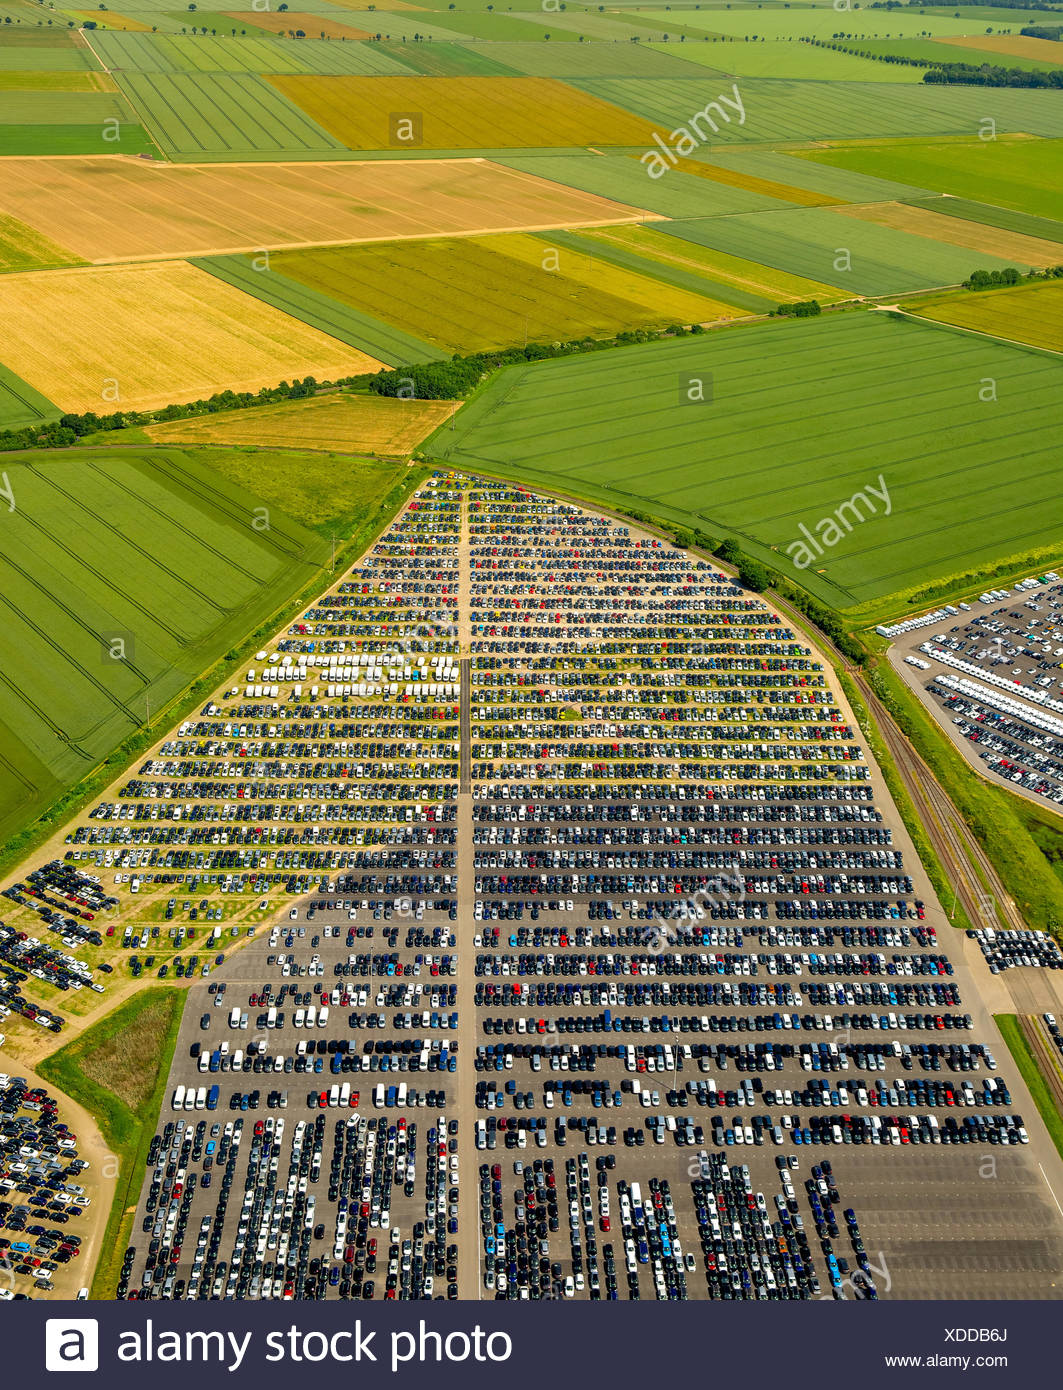 Aerial photograph, new car parking lot surrounded by fields, Citroen, Peugeot, Ford, Wallenius Wilhelmsen Logistics, Zülpich - Stock Image